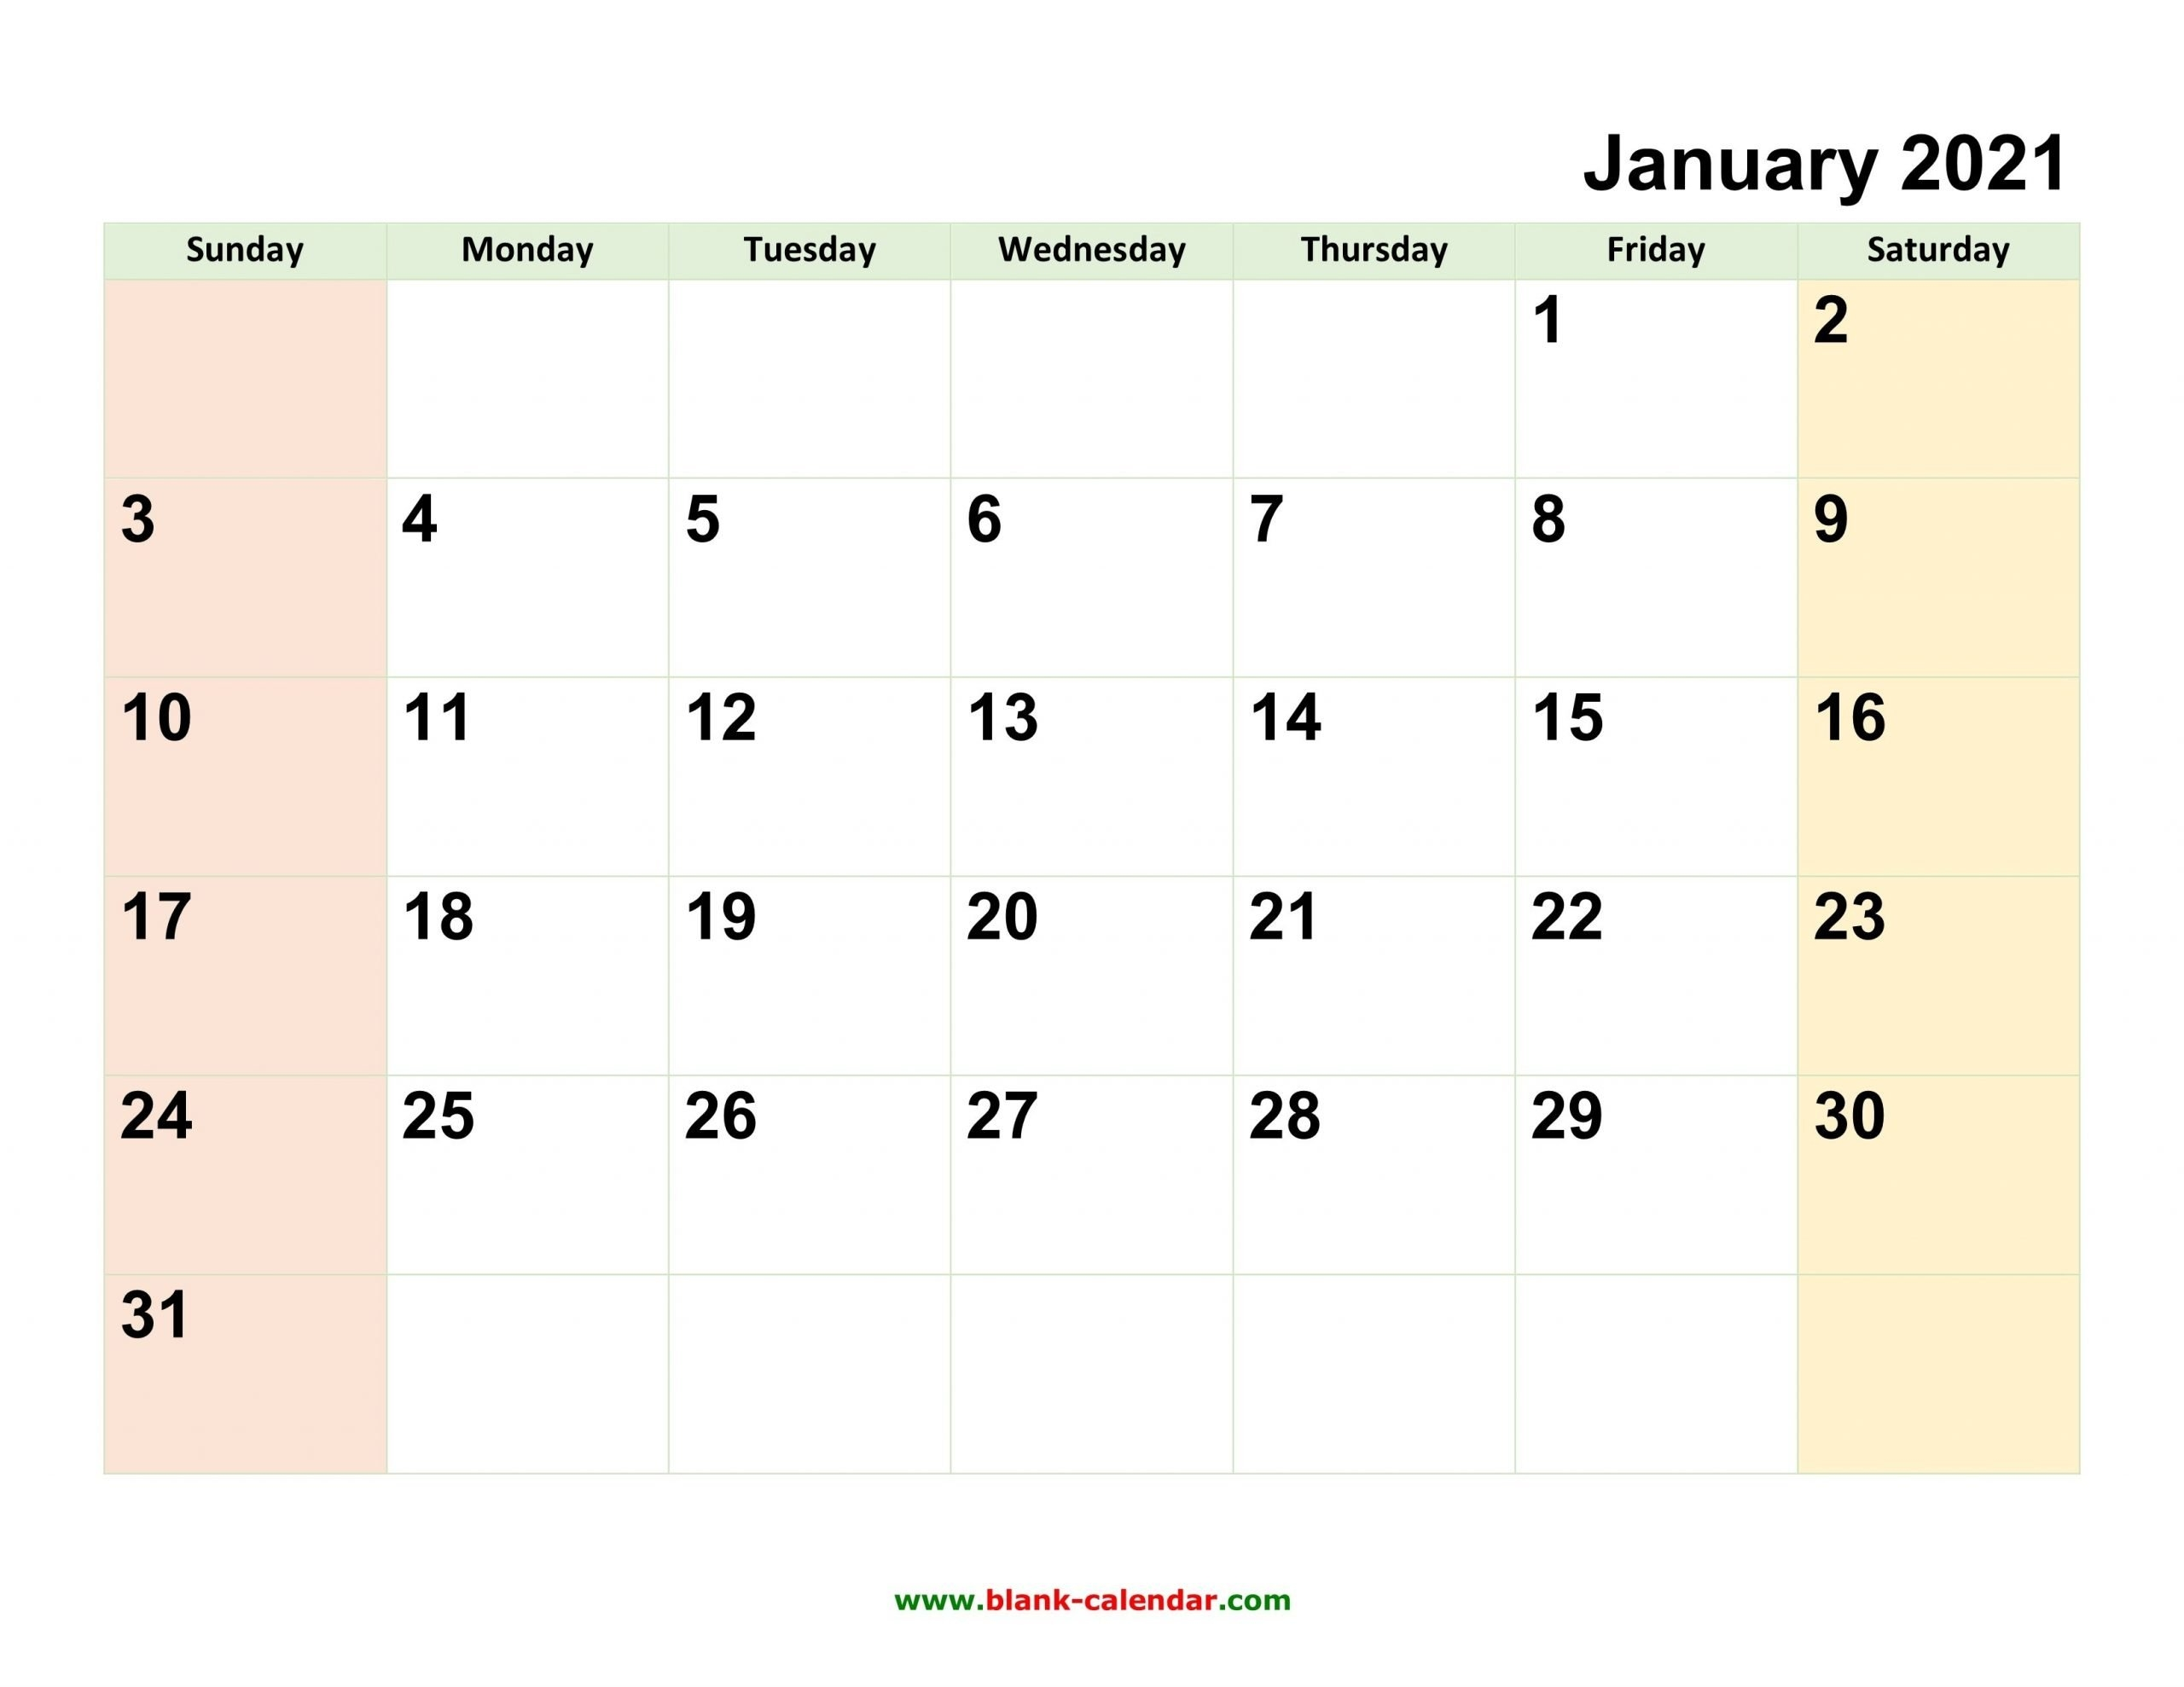 Free Calendar Wizard Word 2021 | Get Your Calendar Printable inside Which Calendar Year Match 2021 Graphics